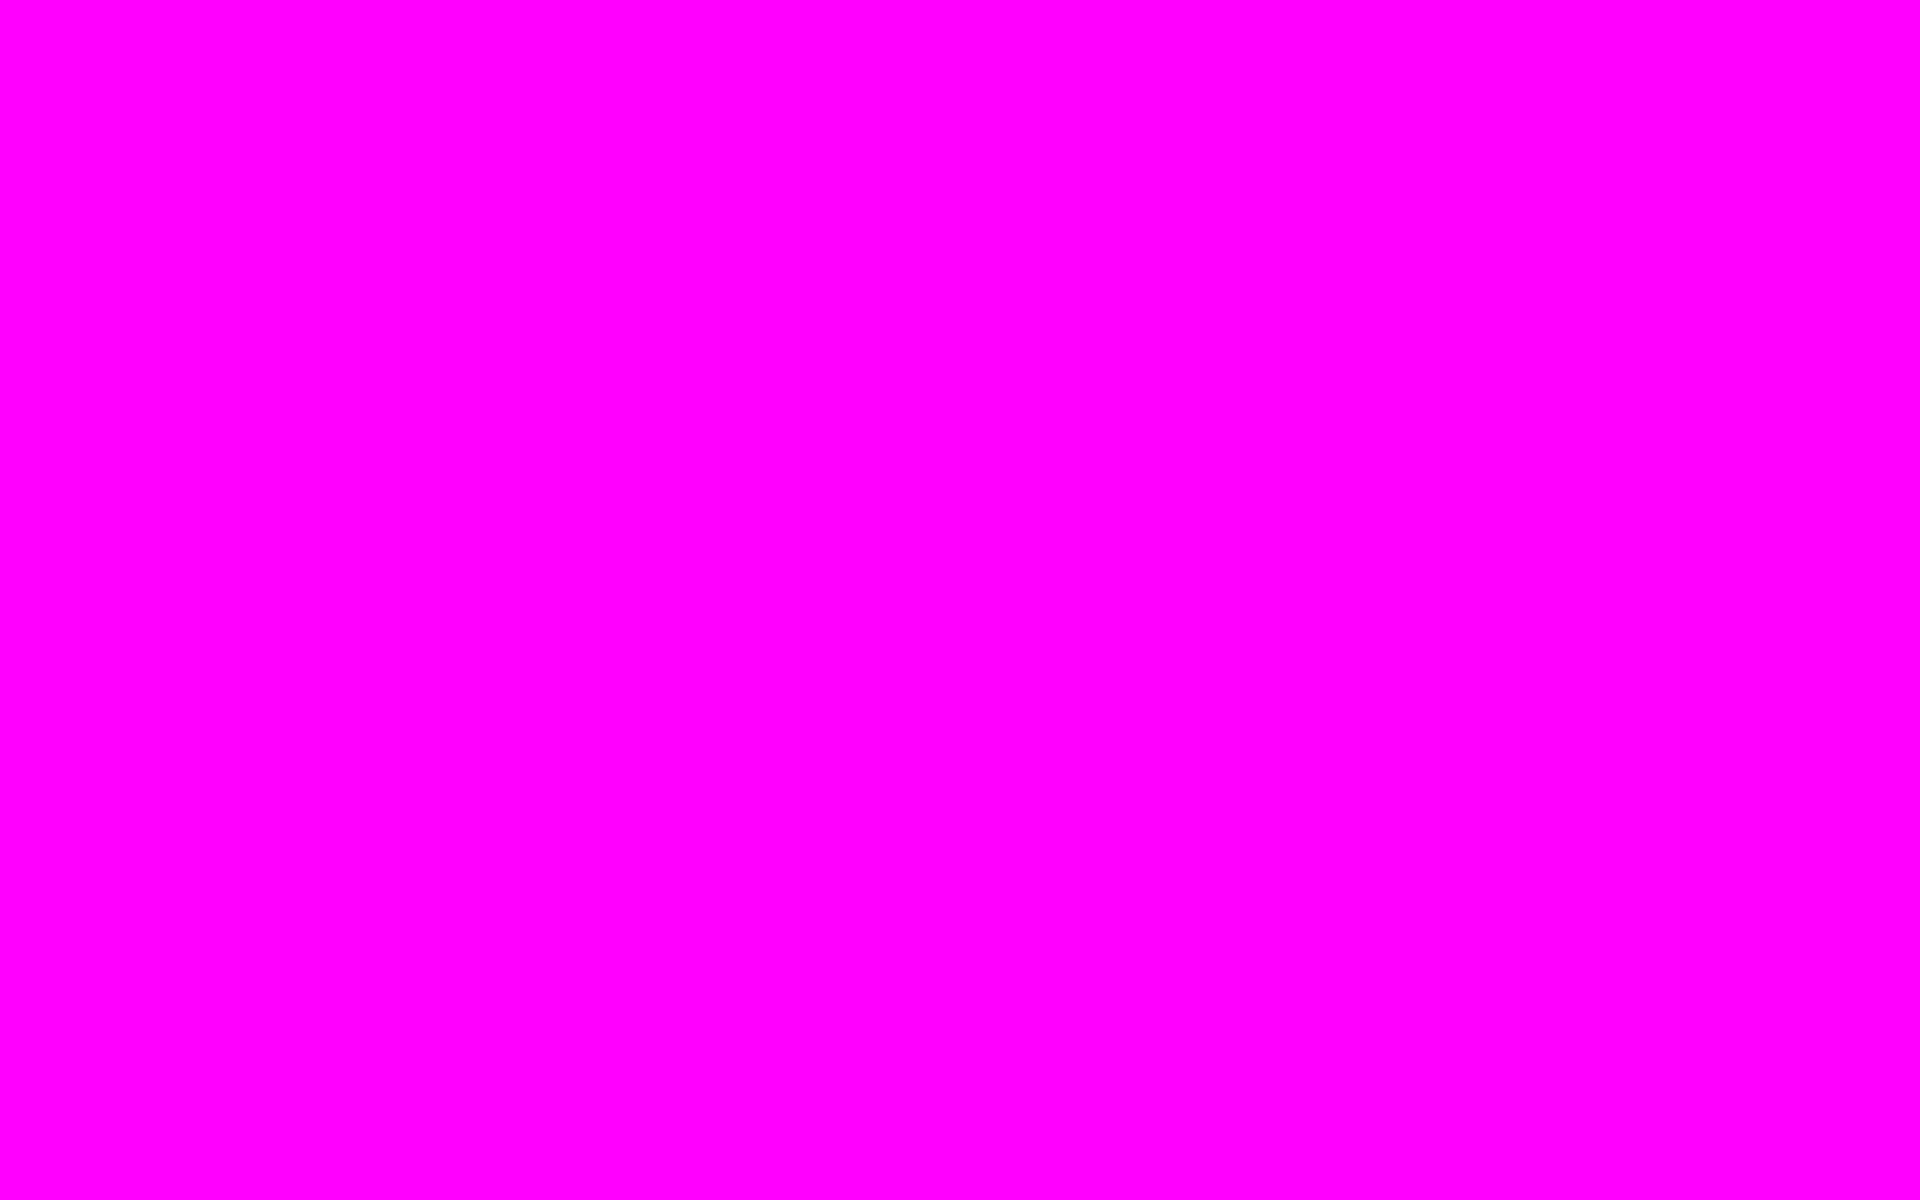 1920x1200 Magenta Solid Color Background